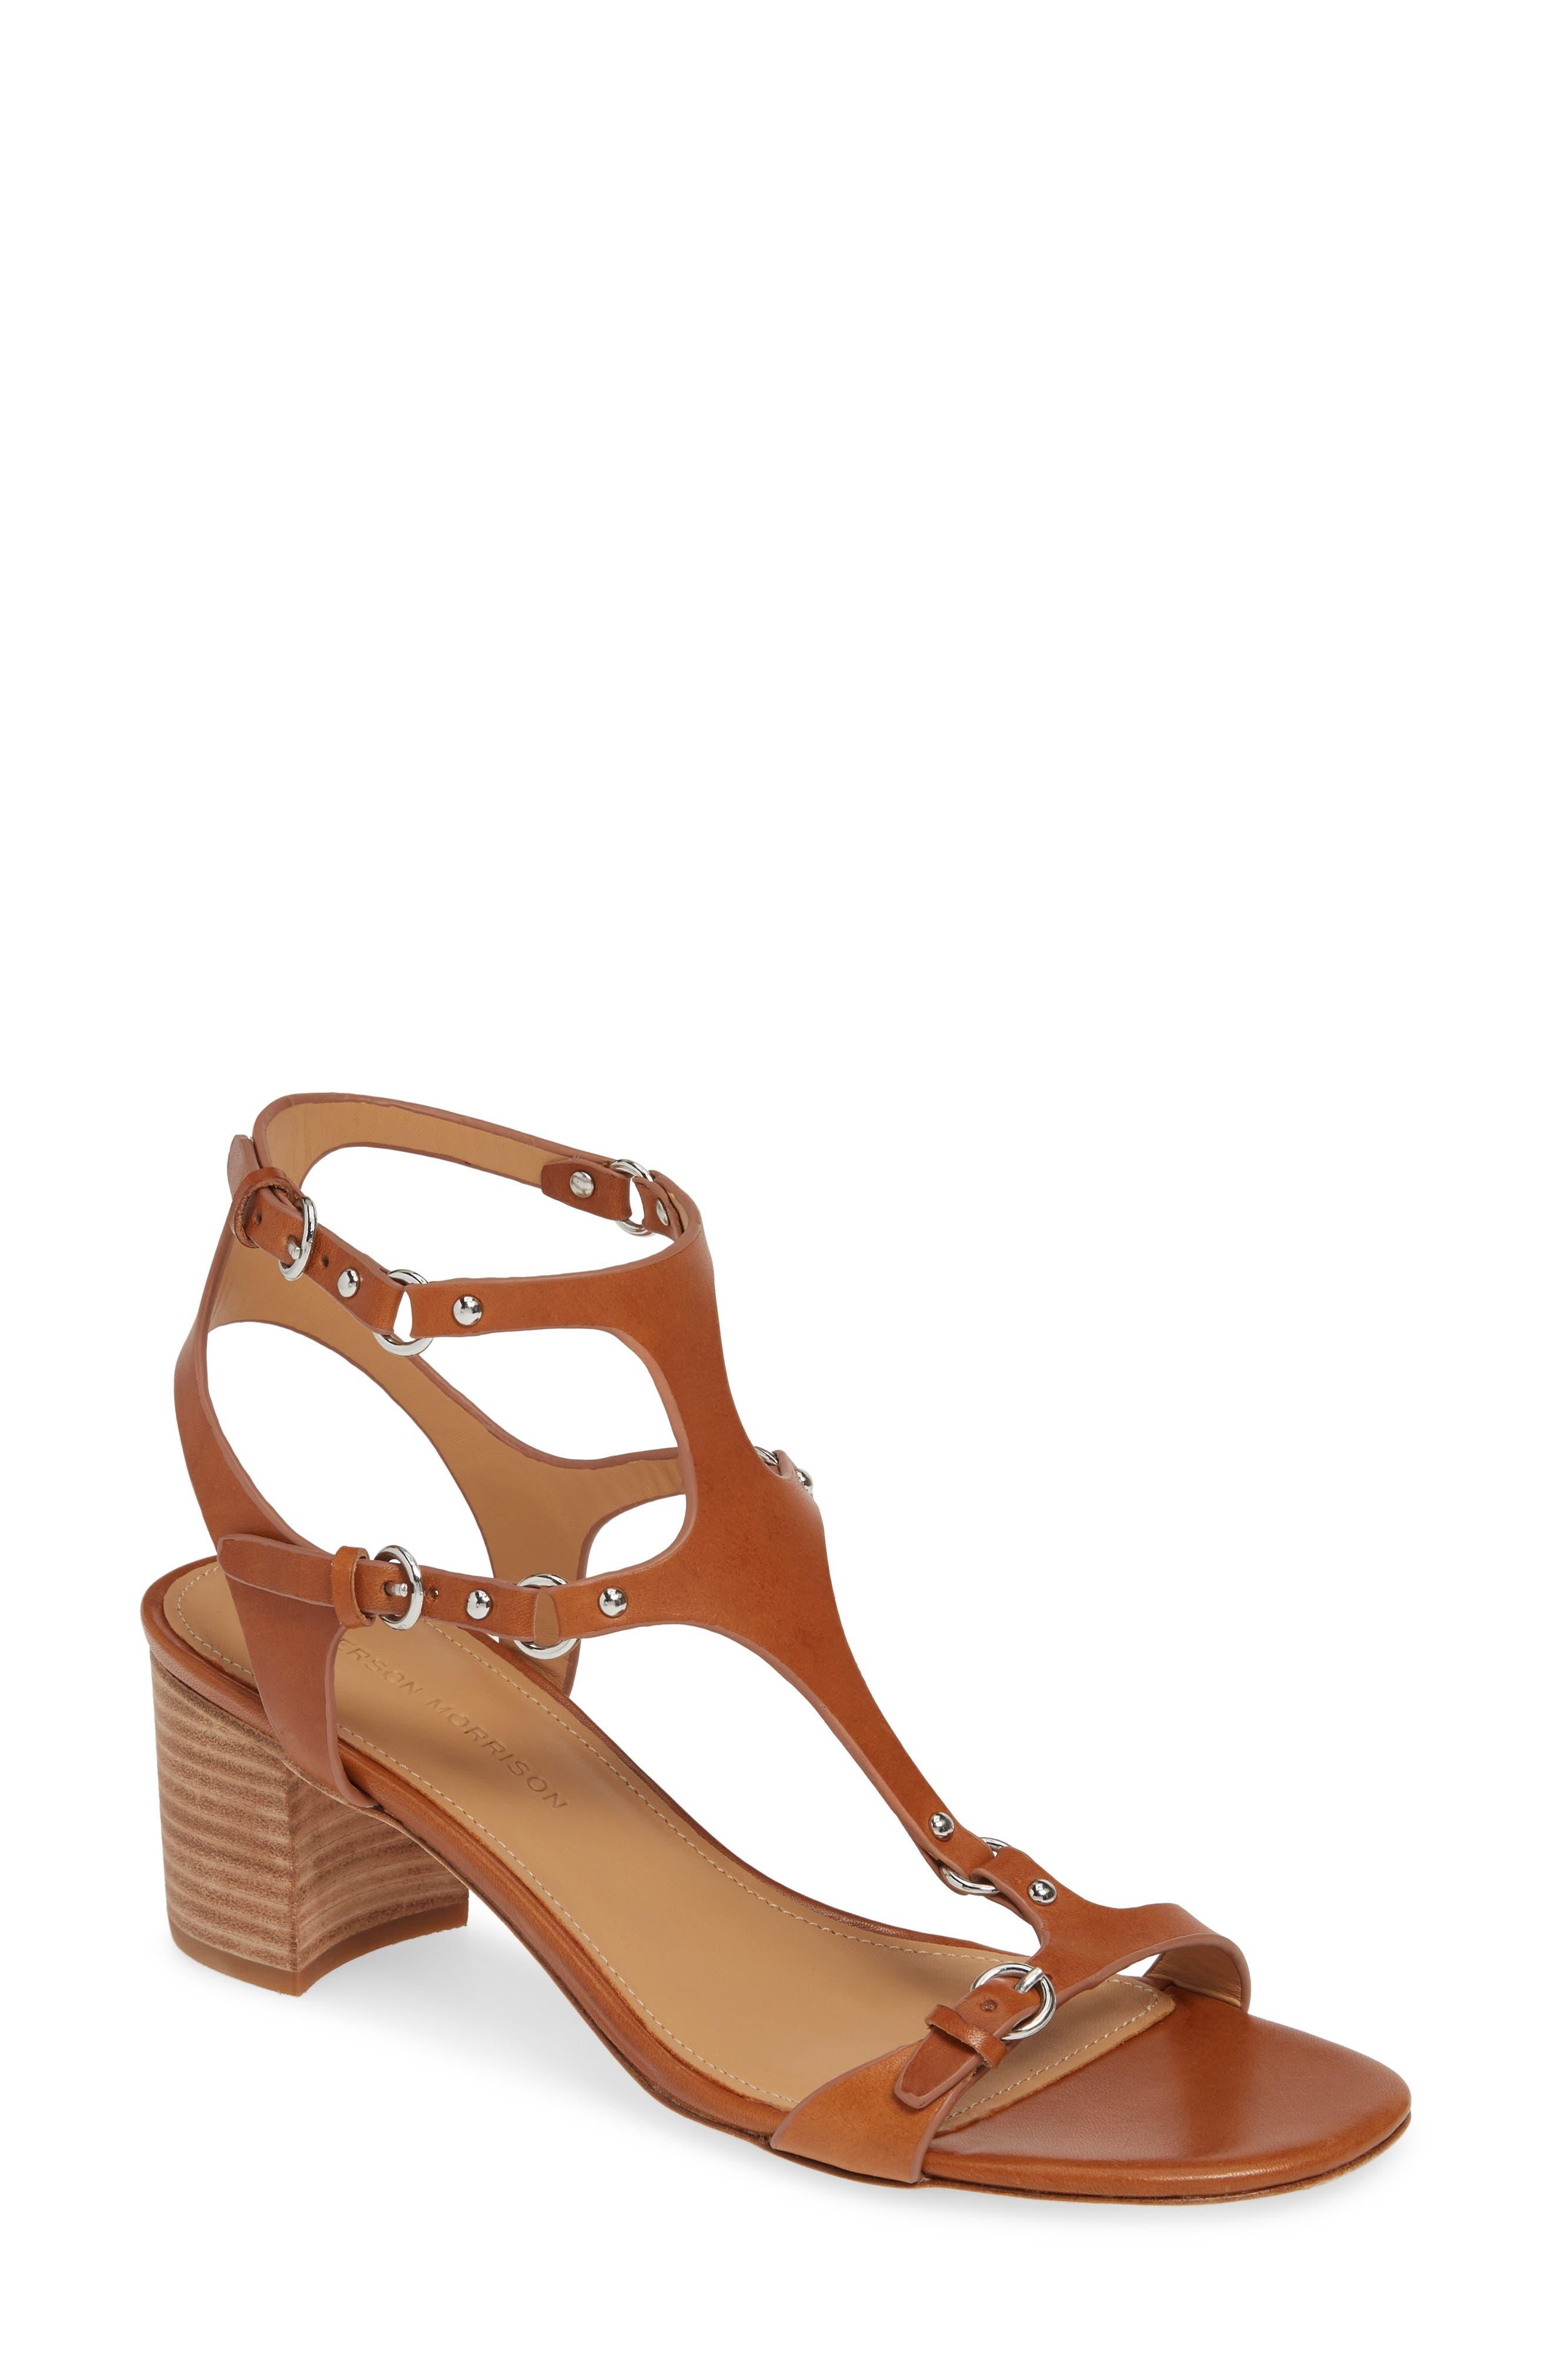 Sigerson Morrison Haven T-Strap Sandal EU - Brown